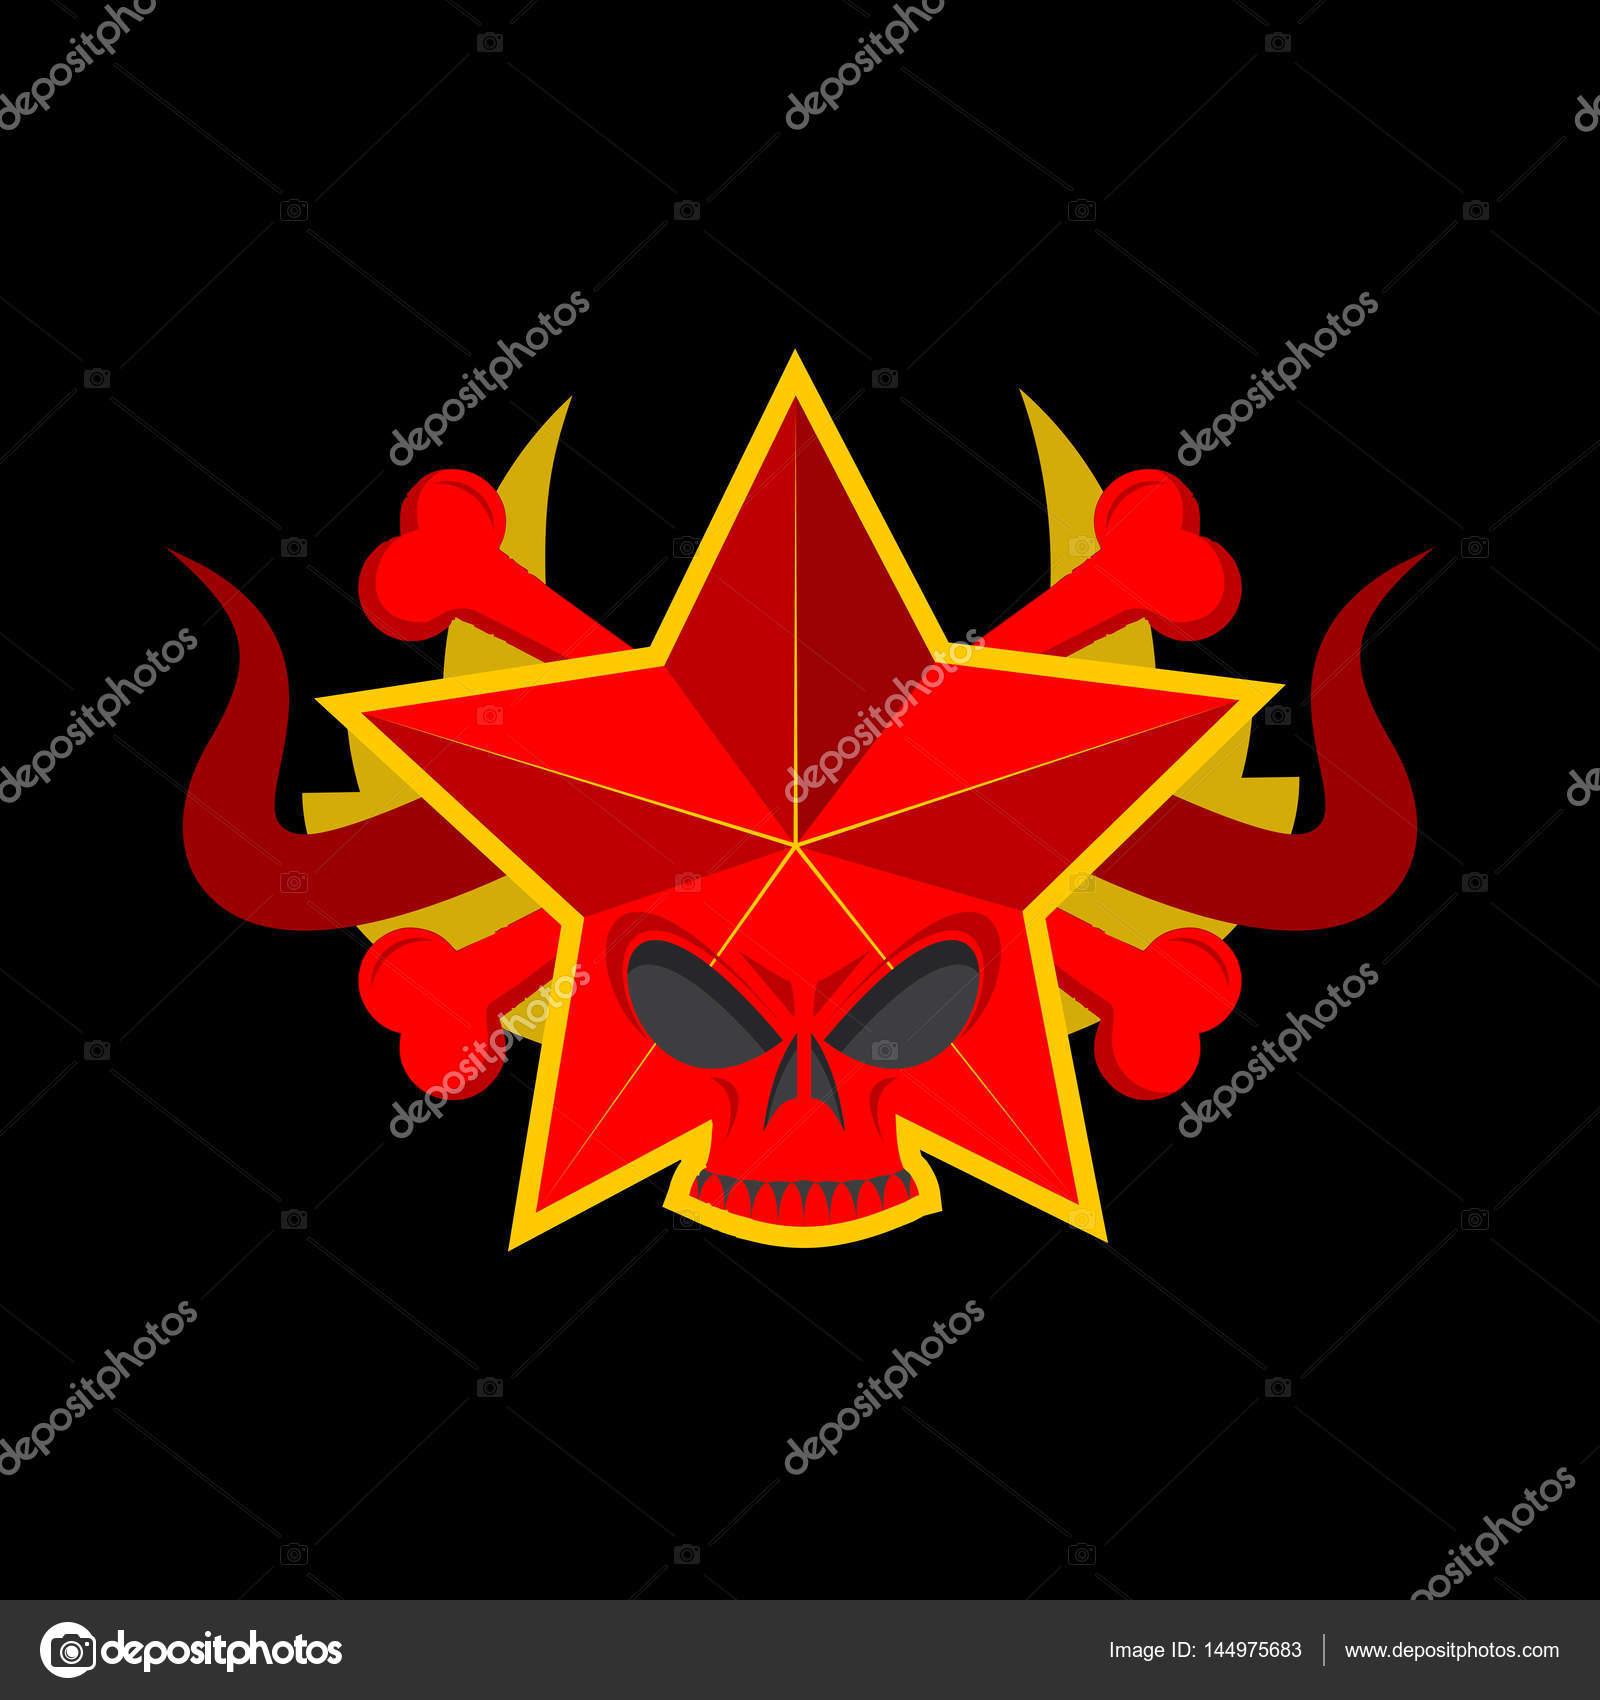 Skull red star symbol of specter of communism ussr emblem of d symbol of specter of communism ussr emblem of d stock biocorpaavc Gallery